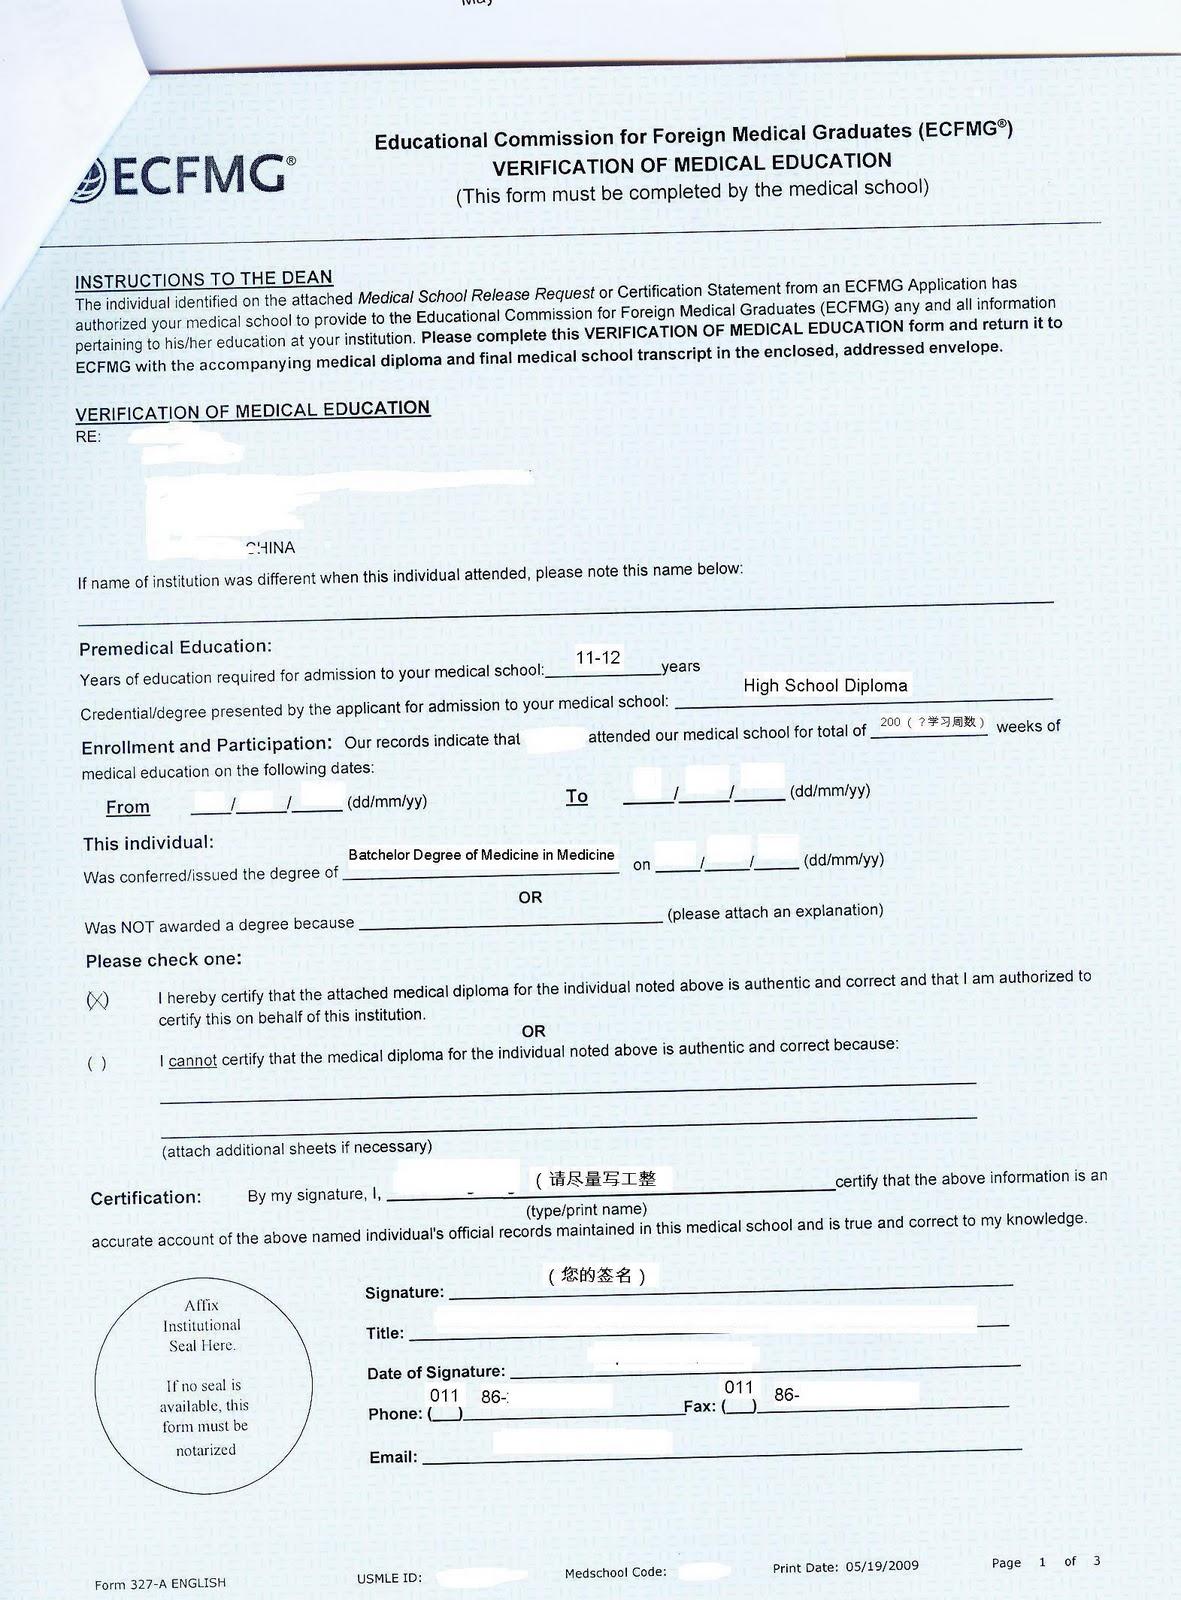 USMLE: ECFMG 寄到医学院验证学位的327a表范例